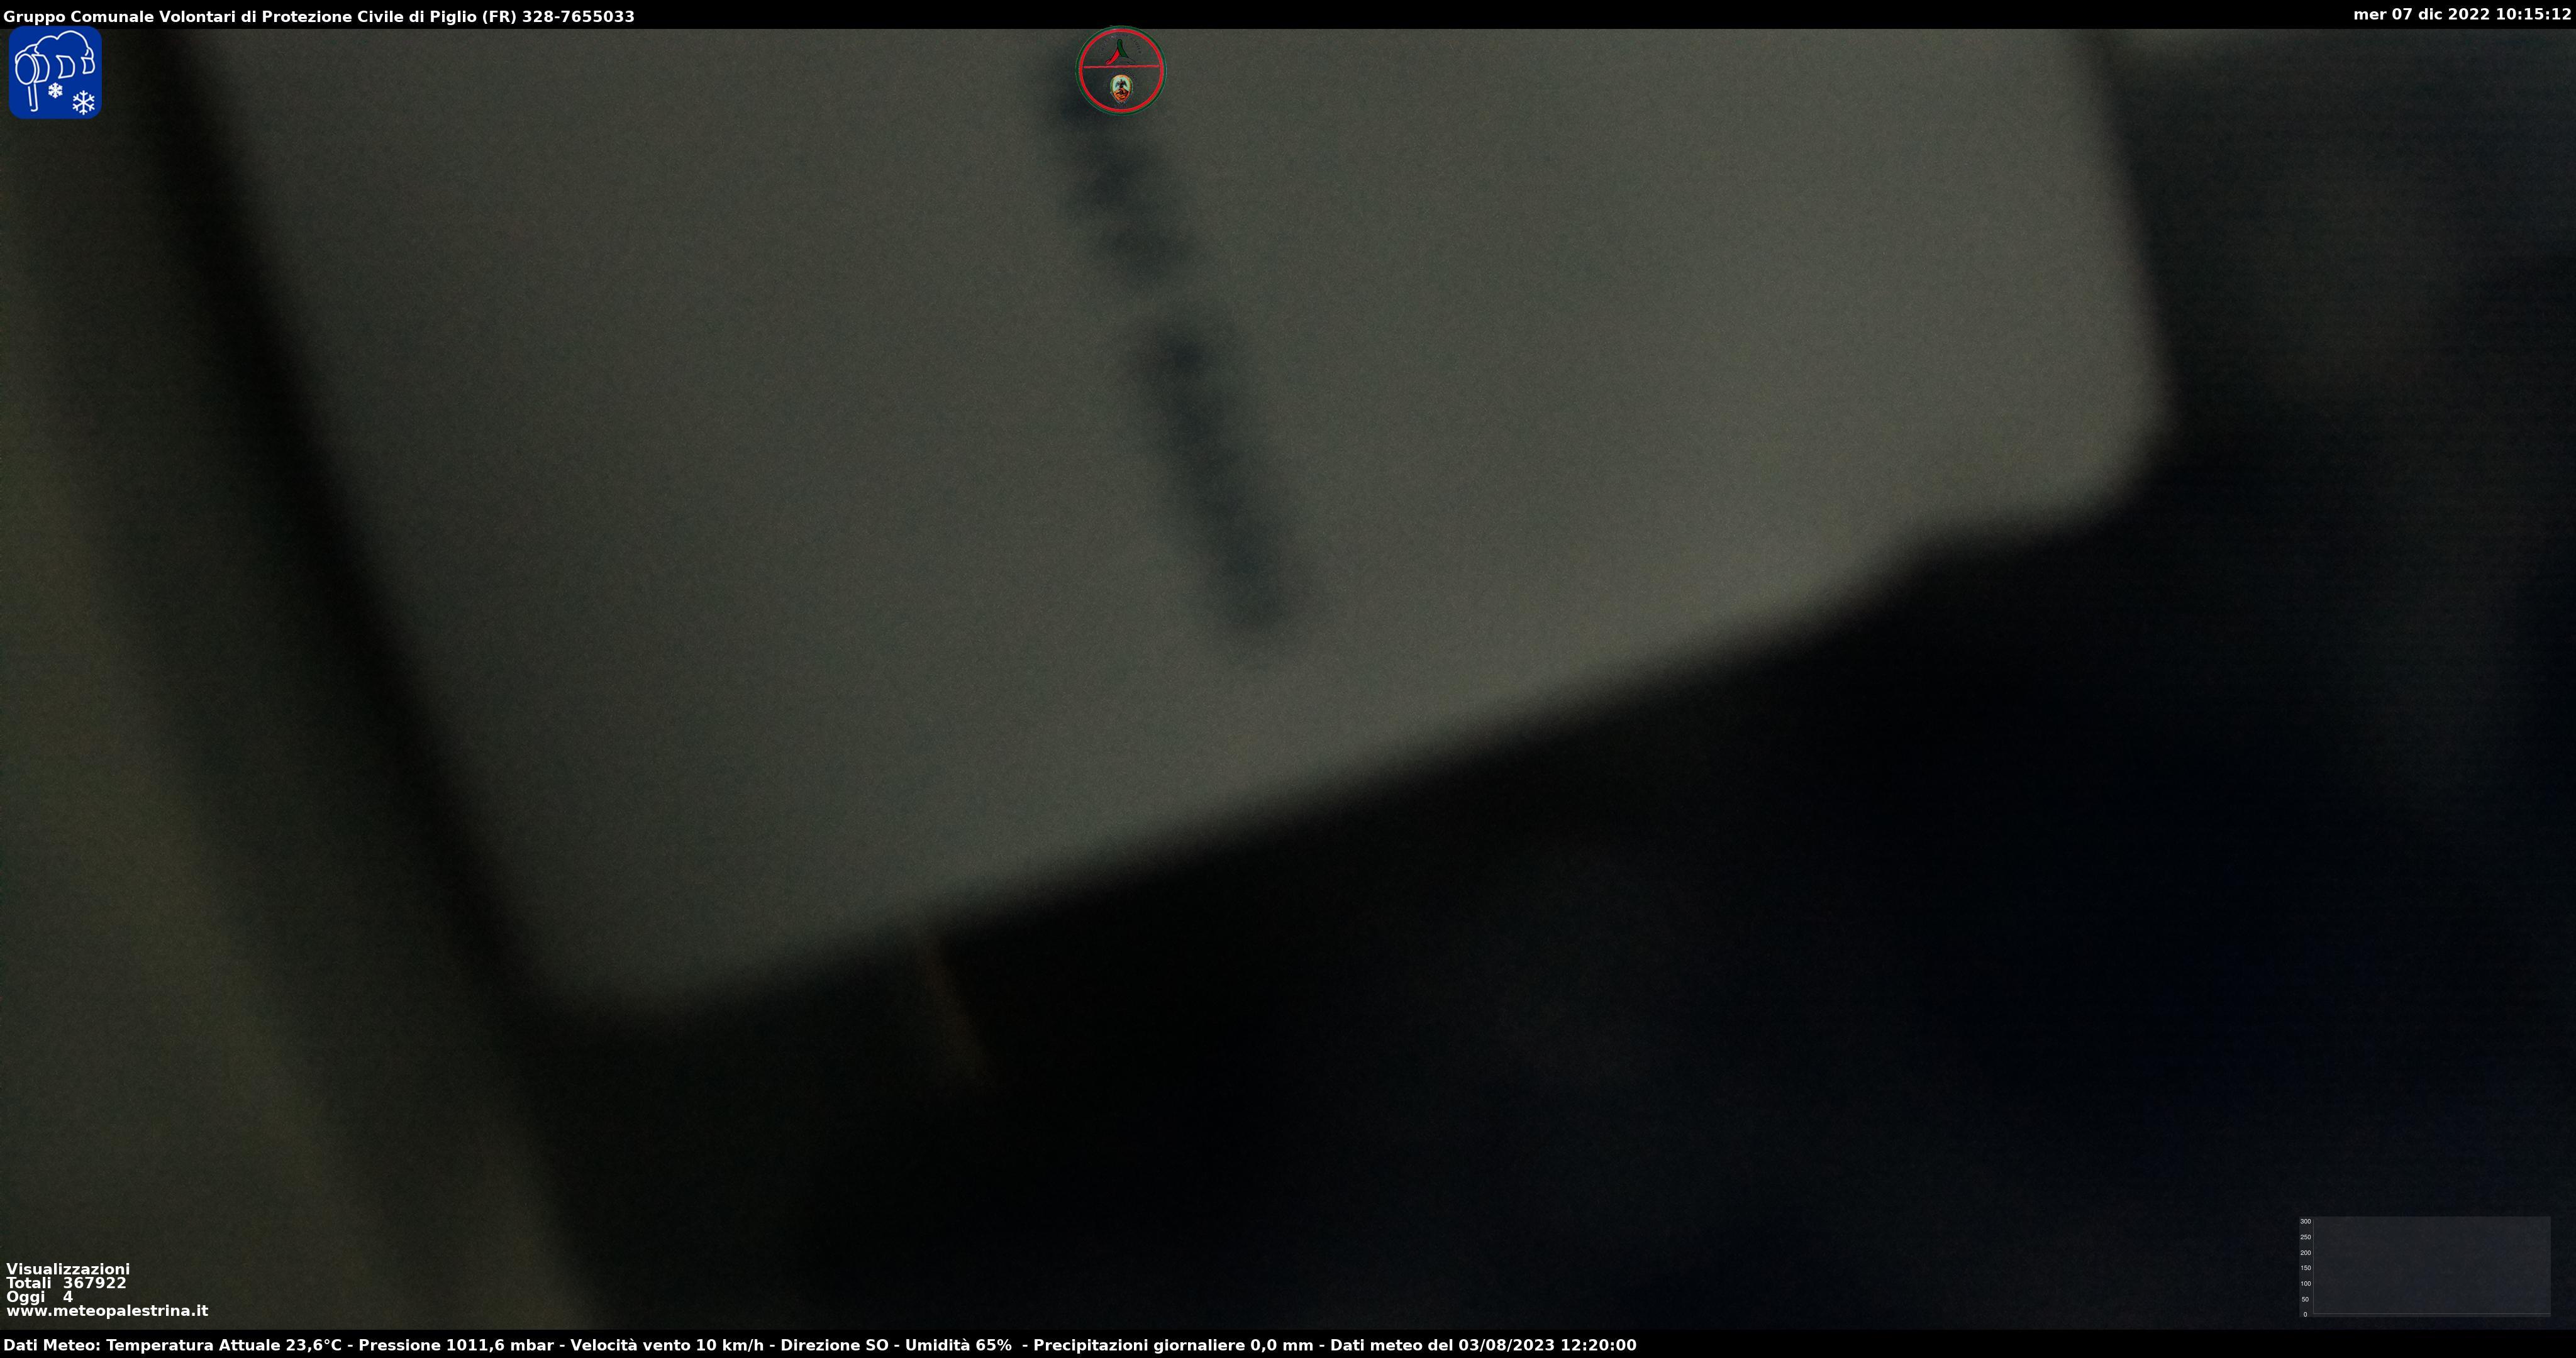 Webcam Piglio - Meteo Palestrina